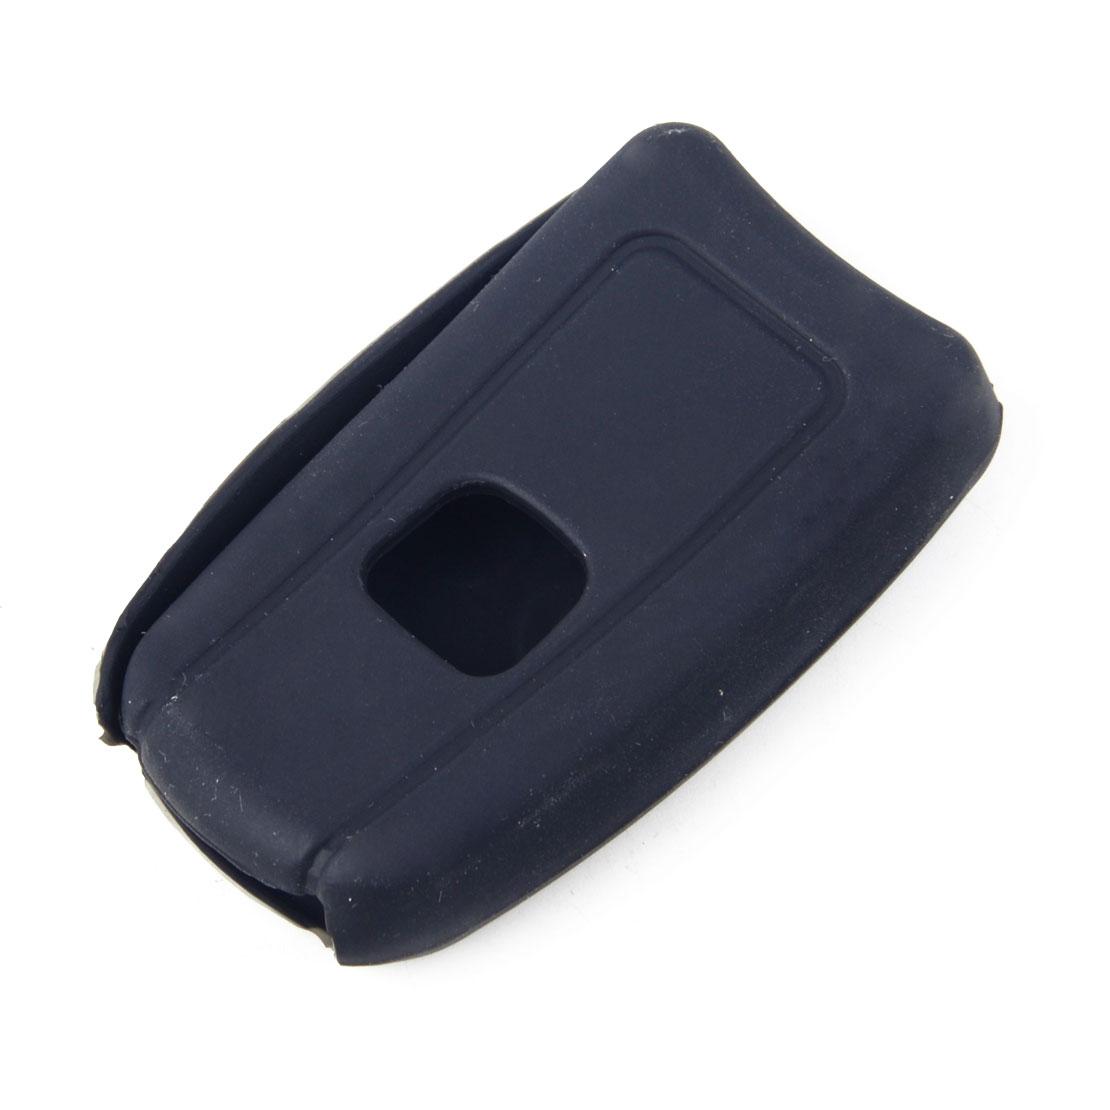 Black Silicone Keyless Remote Flip 3BTN Key Fob Case Fits